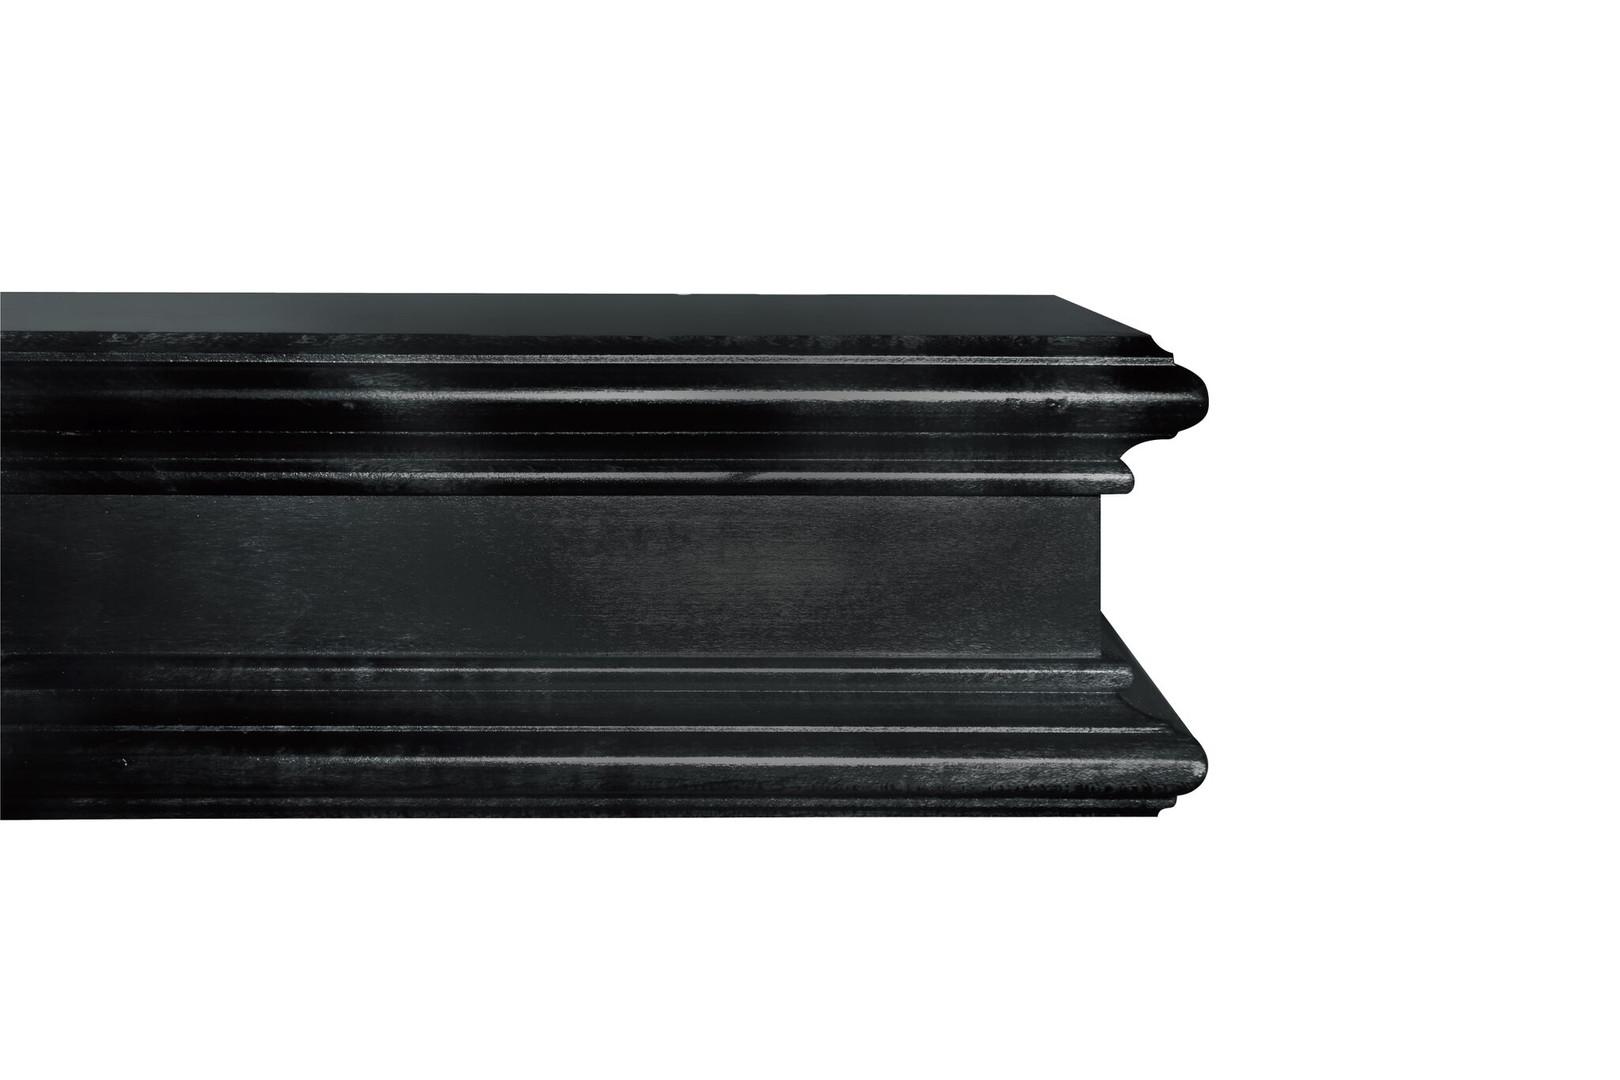 Mahogany-Shelf-Classic-2-black.jpg